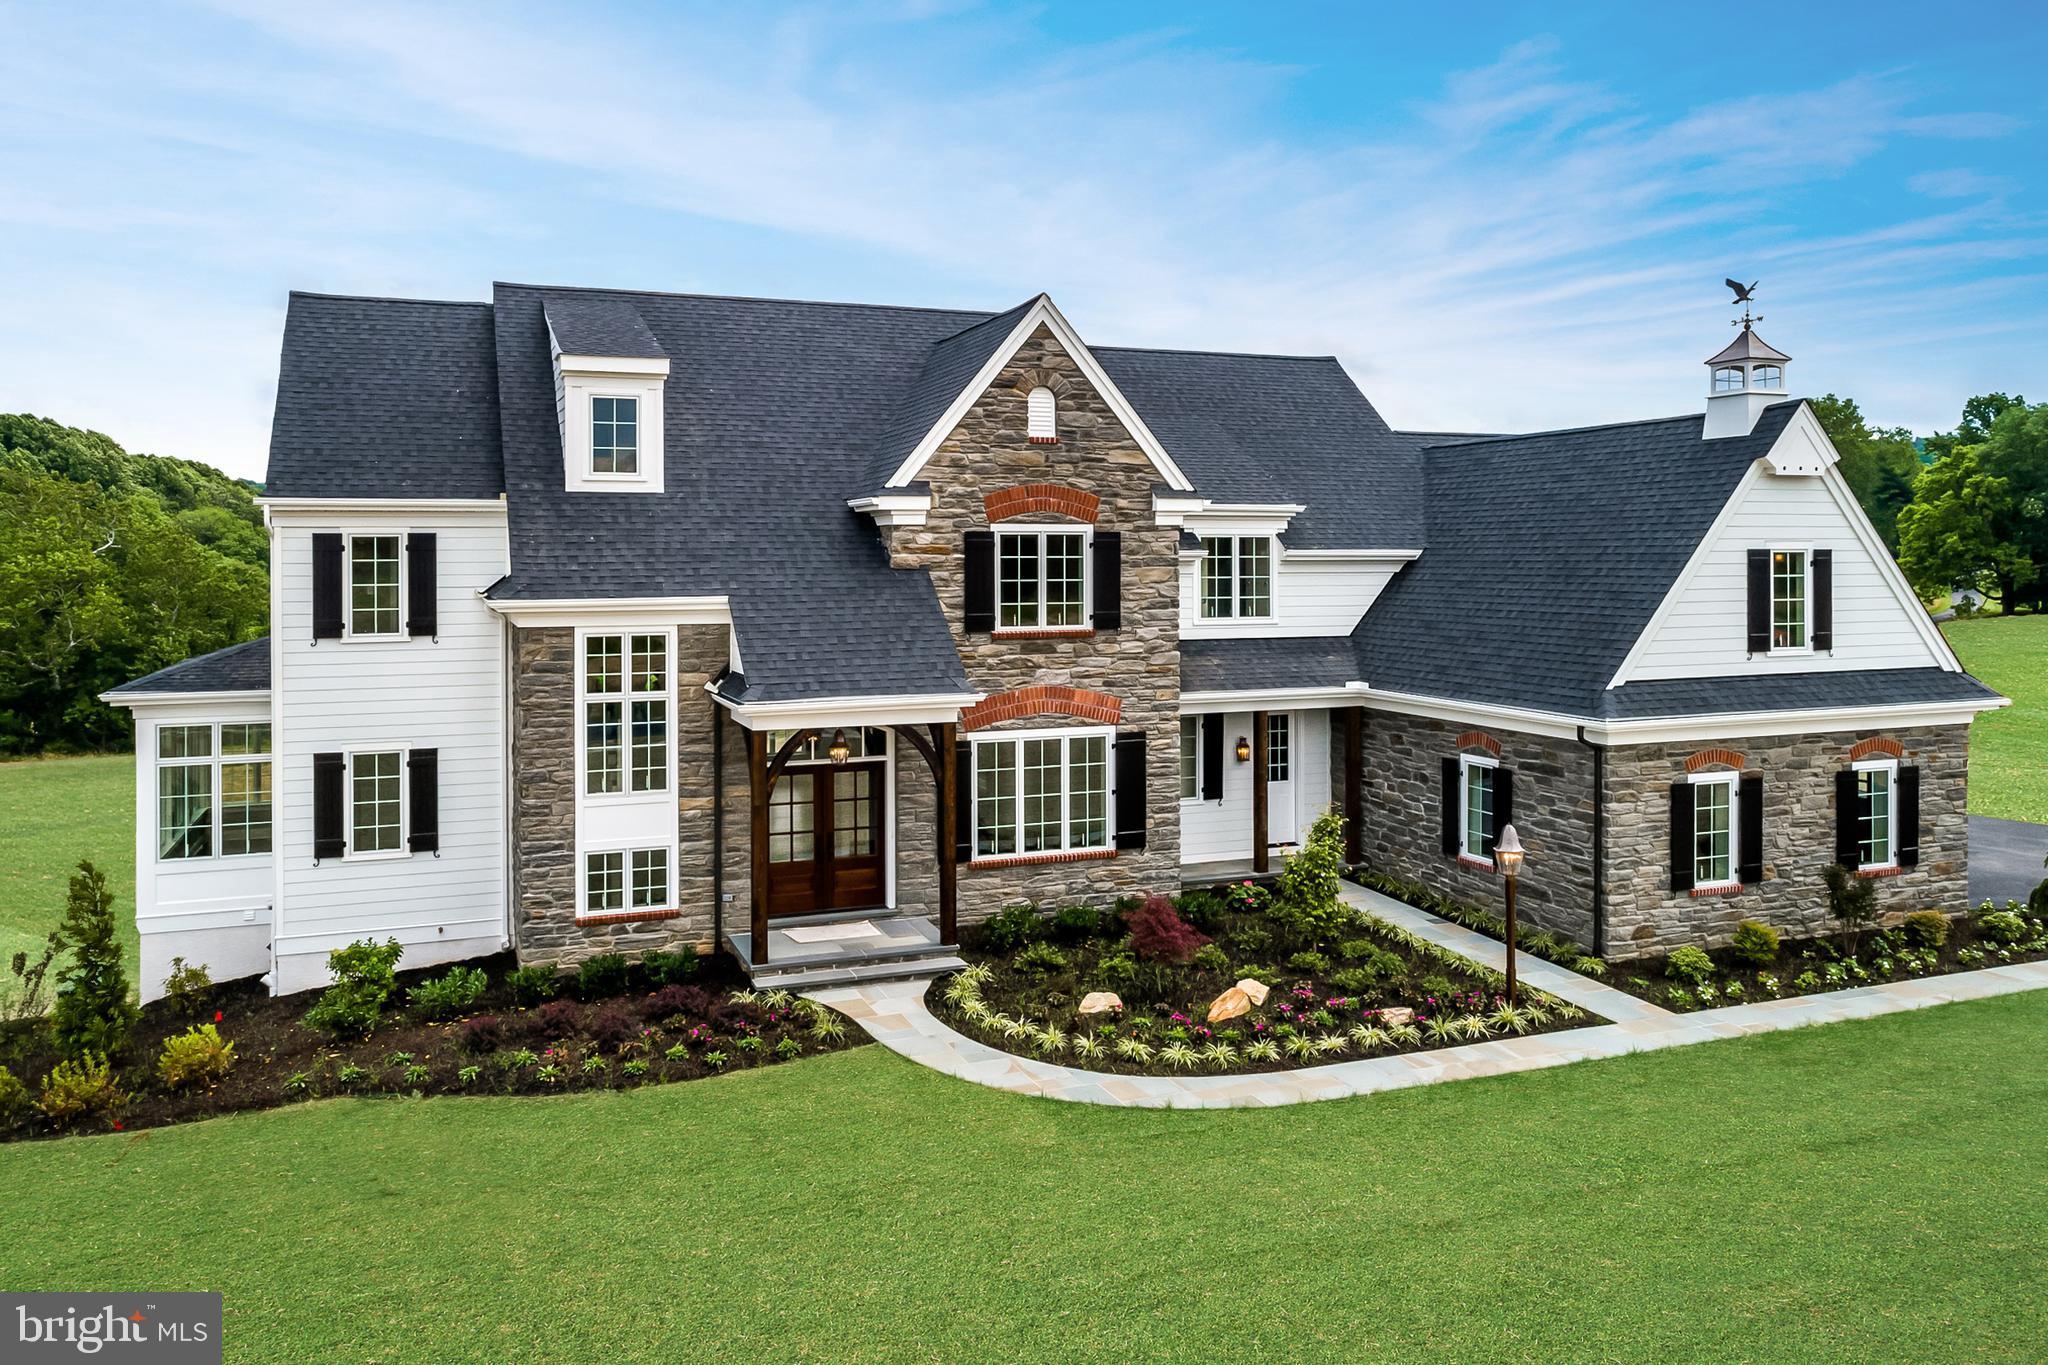 550B HOPWOOD ROAD, COLLEGEVILLE, Pennsylvania 19426, 4 Bedrooms Bedrooms, ,5 BathroomsBathrooms,Single Family,For Sale,550B HOPWOOD ROAD,PAMC690850